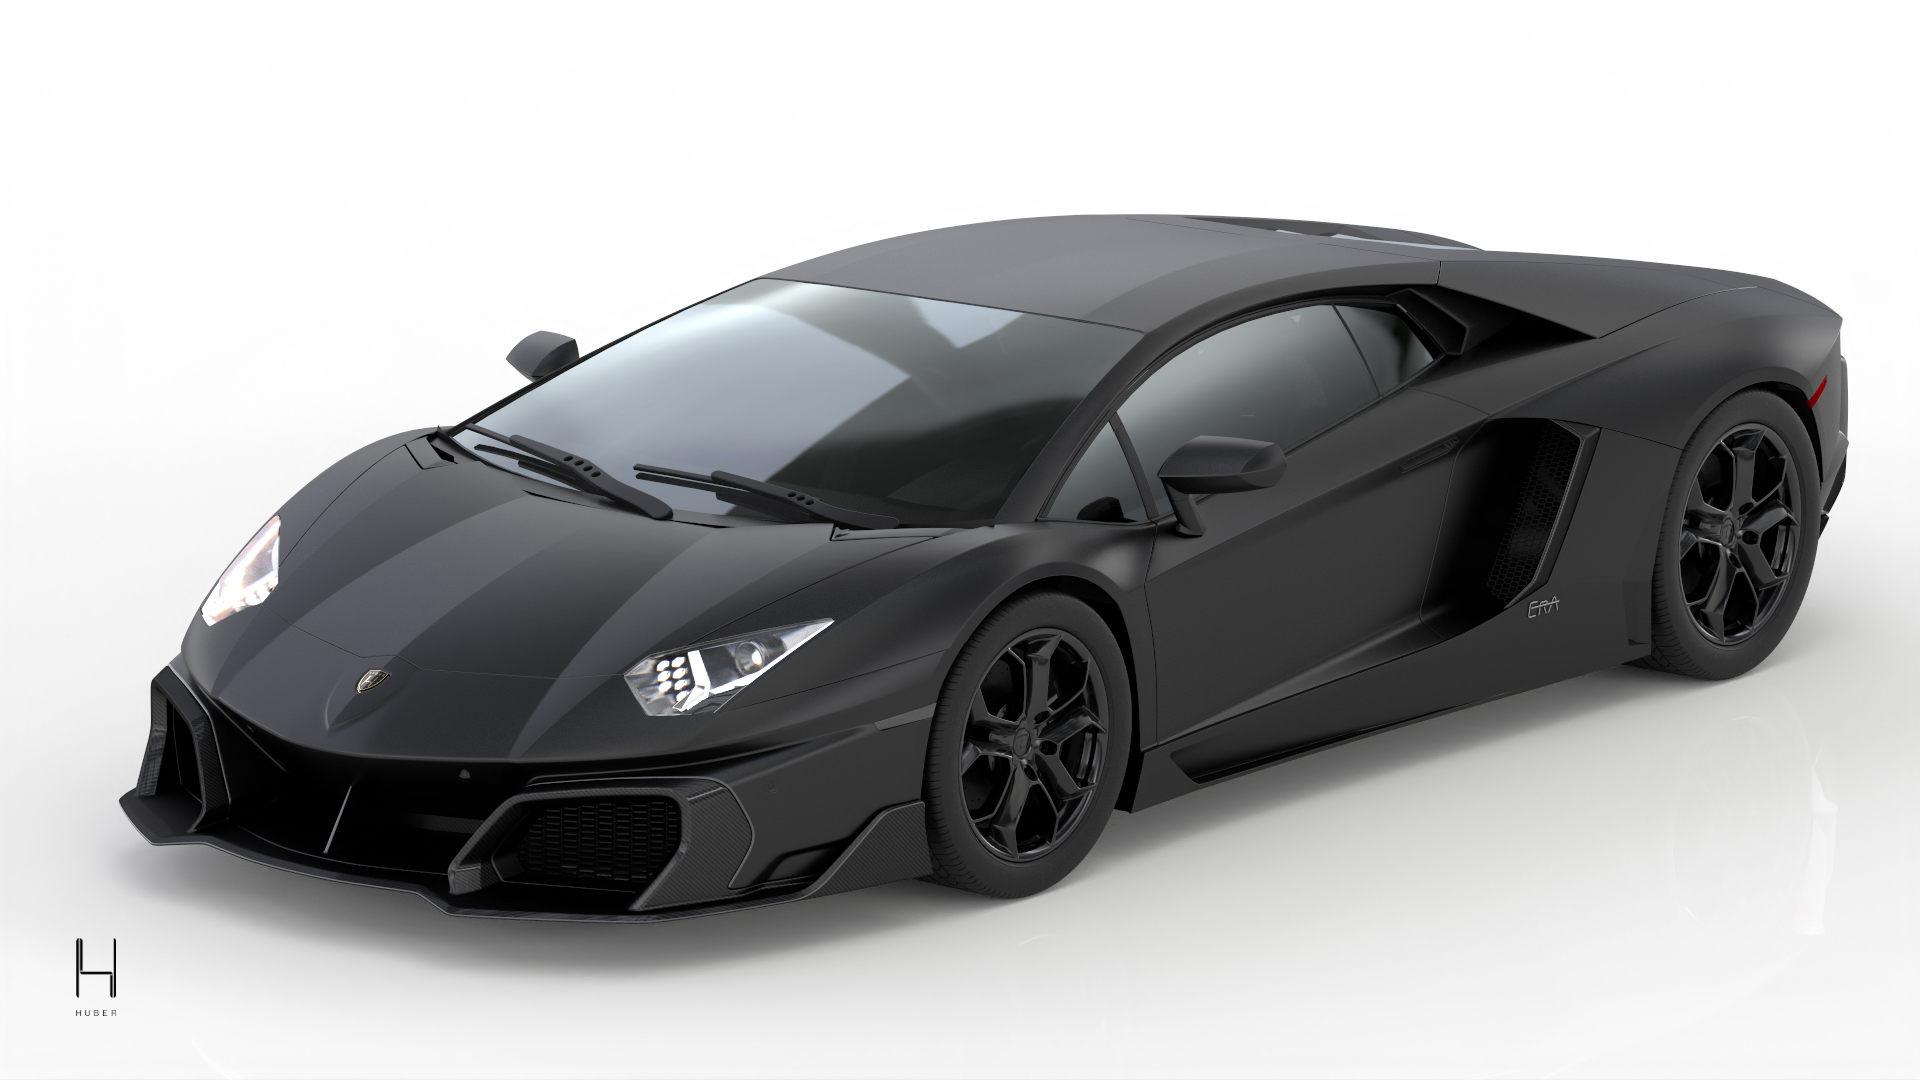 Lamborghini-Aventador-by-Huber-1